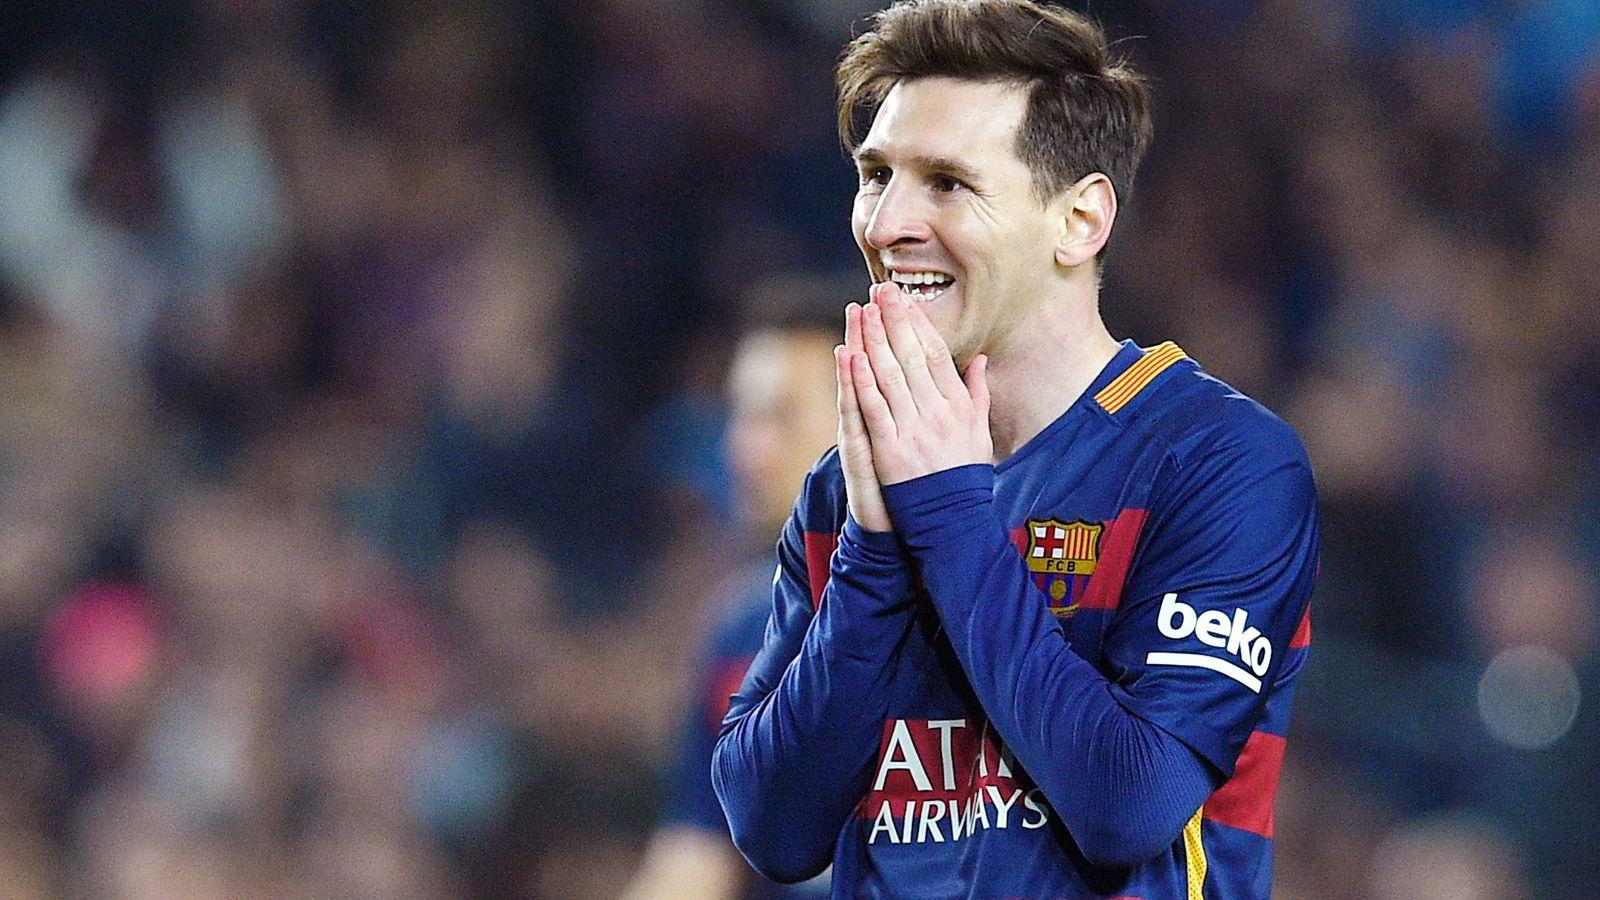 Barcelona-stjernen Lionel Messi er sammen med sin far tiltalt for skattesvik i Spania på over fire millioner euro.